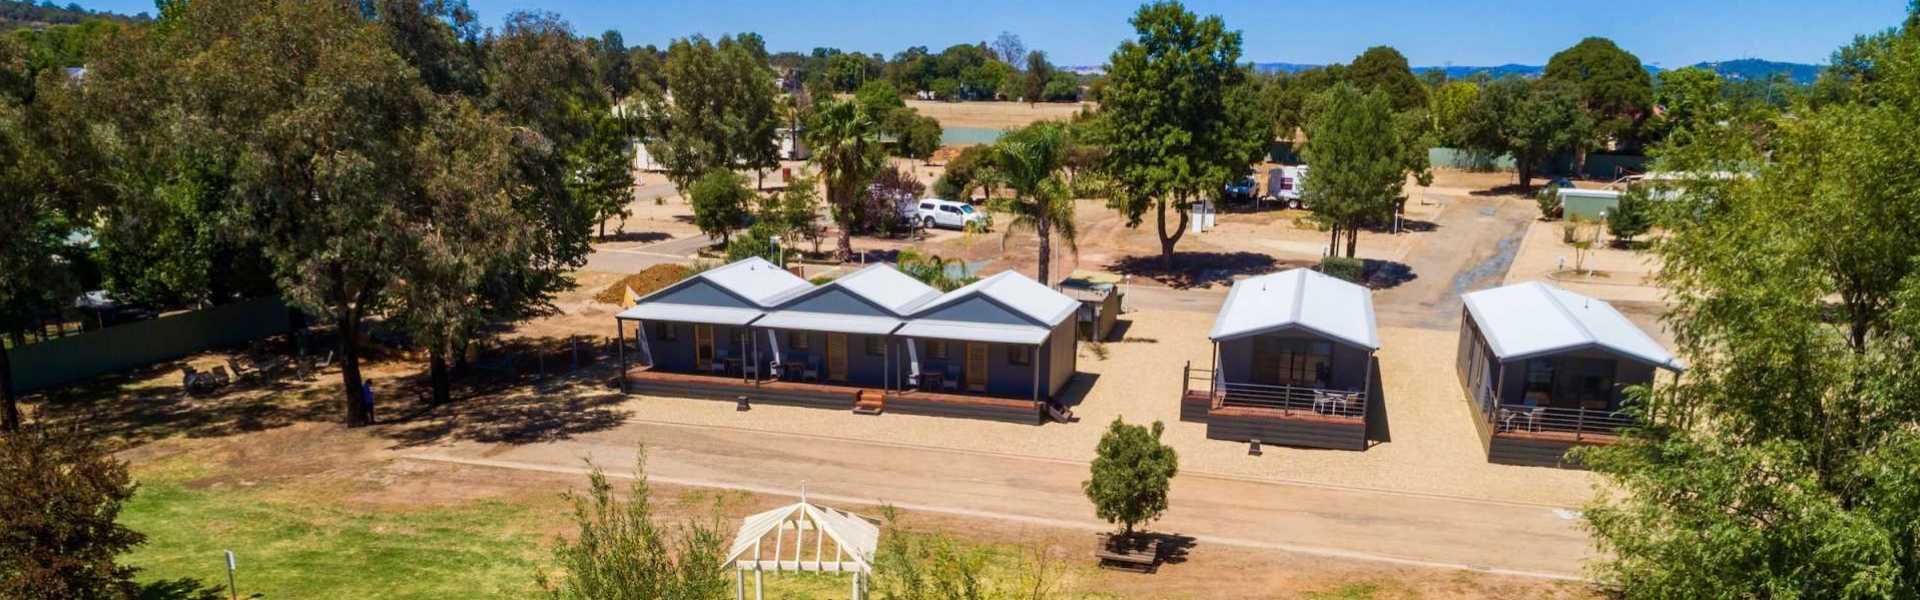 Kui Parks, Horseshoe Tourist Park, Wagga Wagga